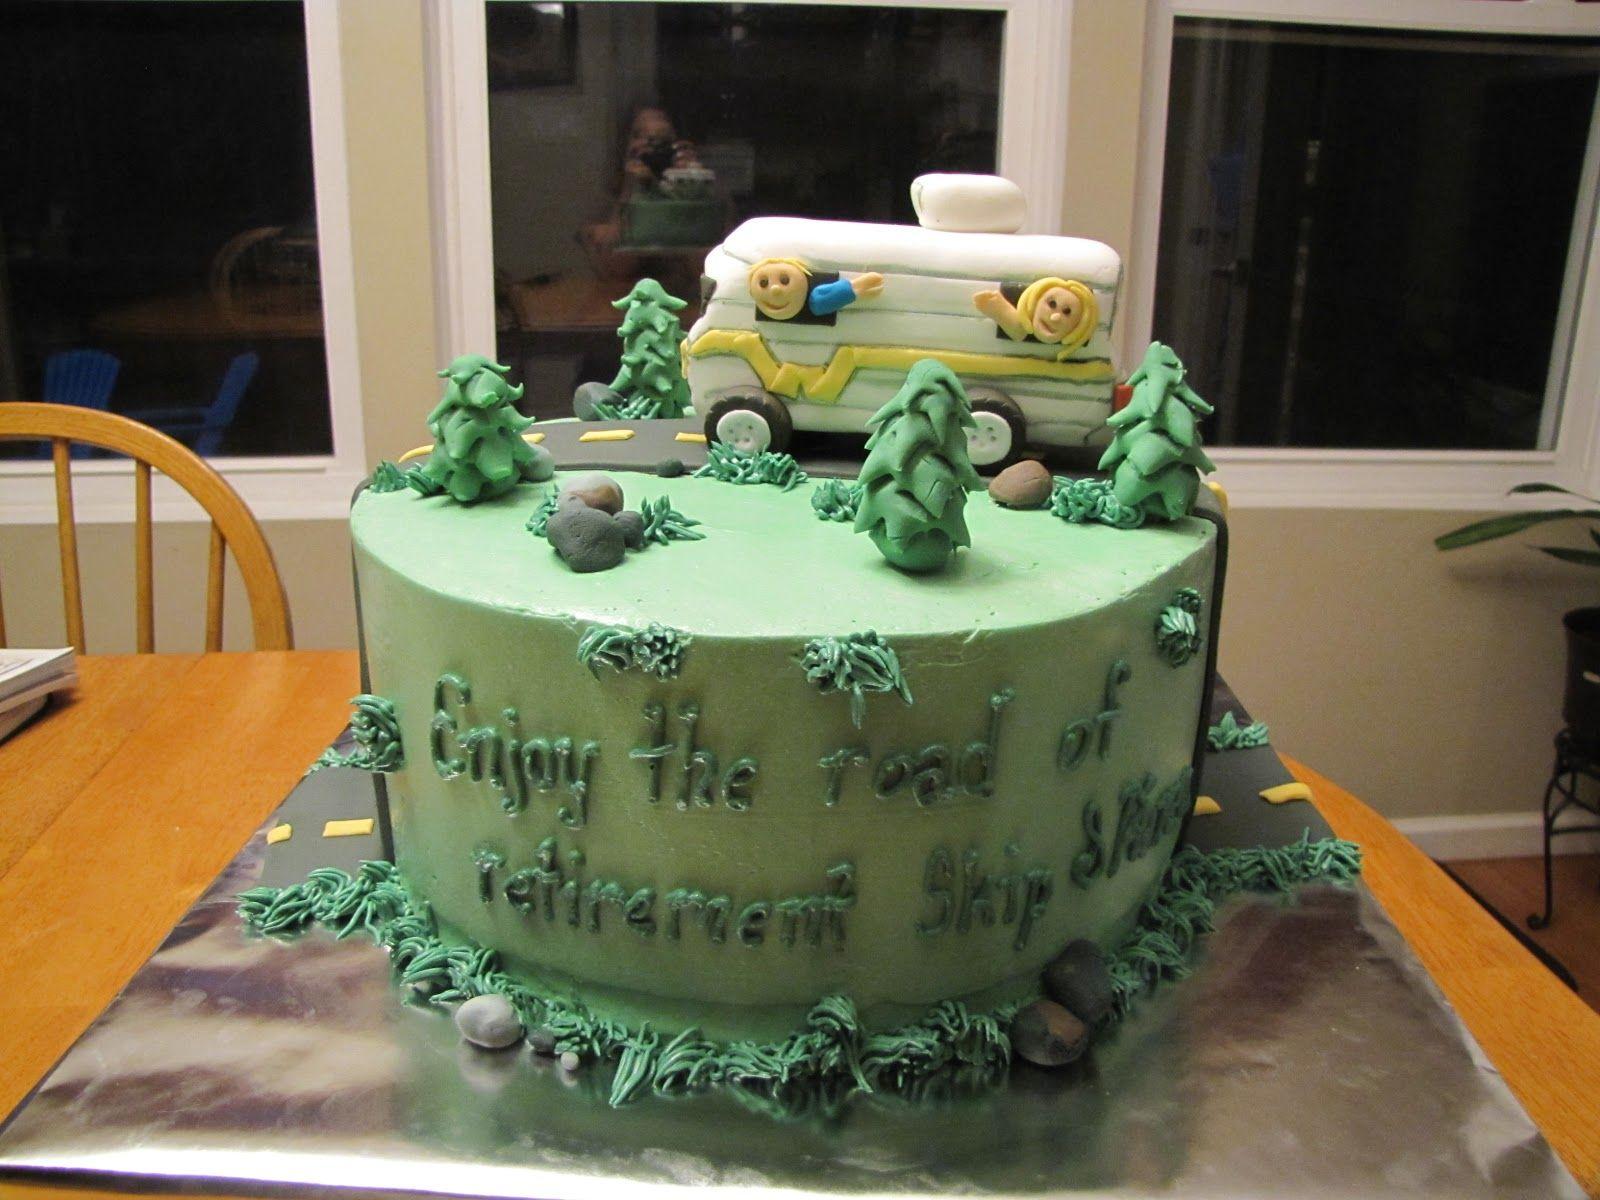 road+of+retirement+cake.jpg (1600×1200)